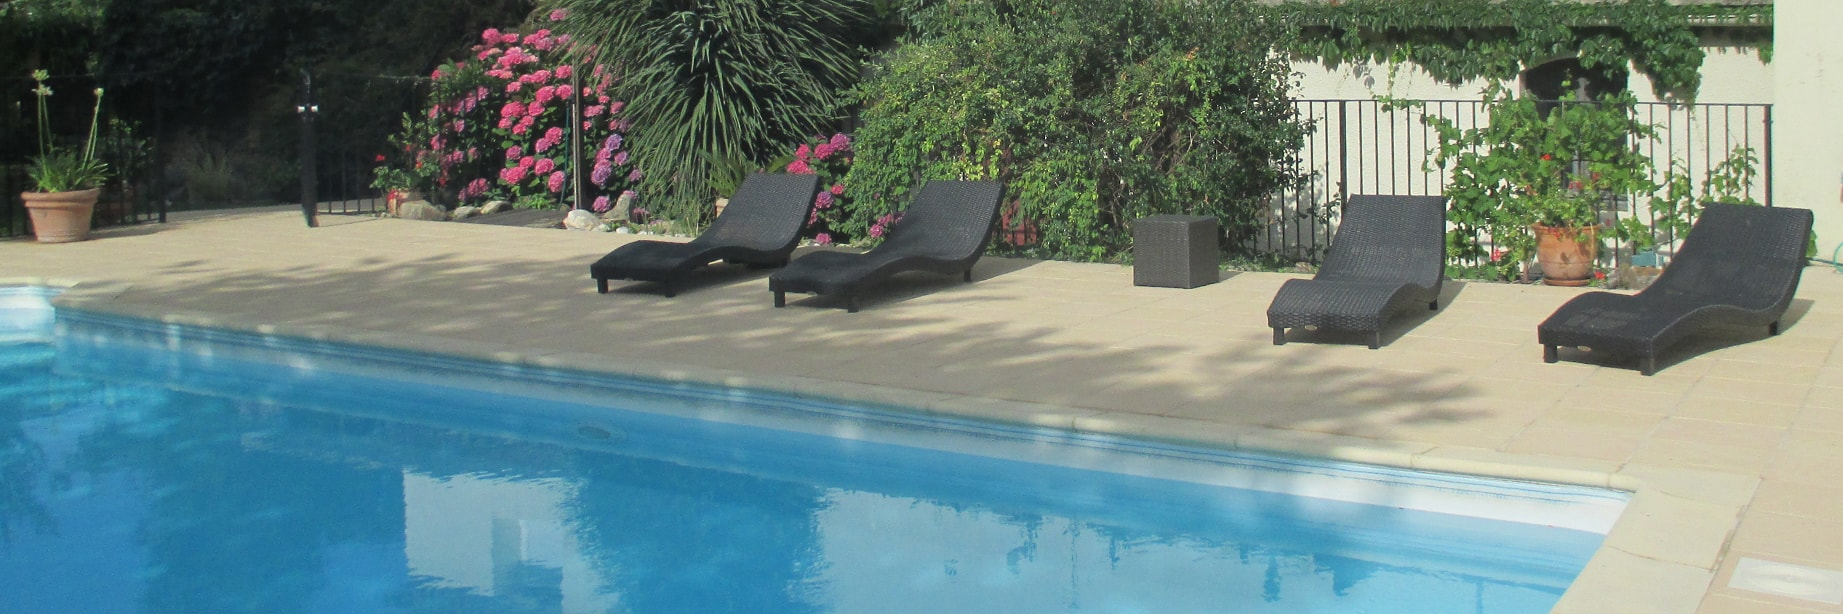 la piscine gîtes La Filature